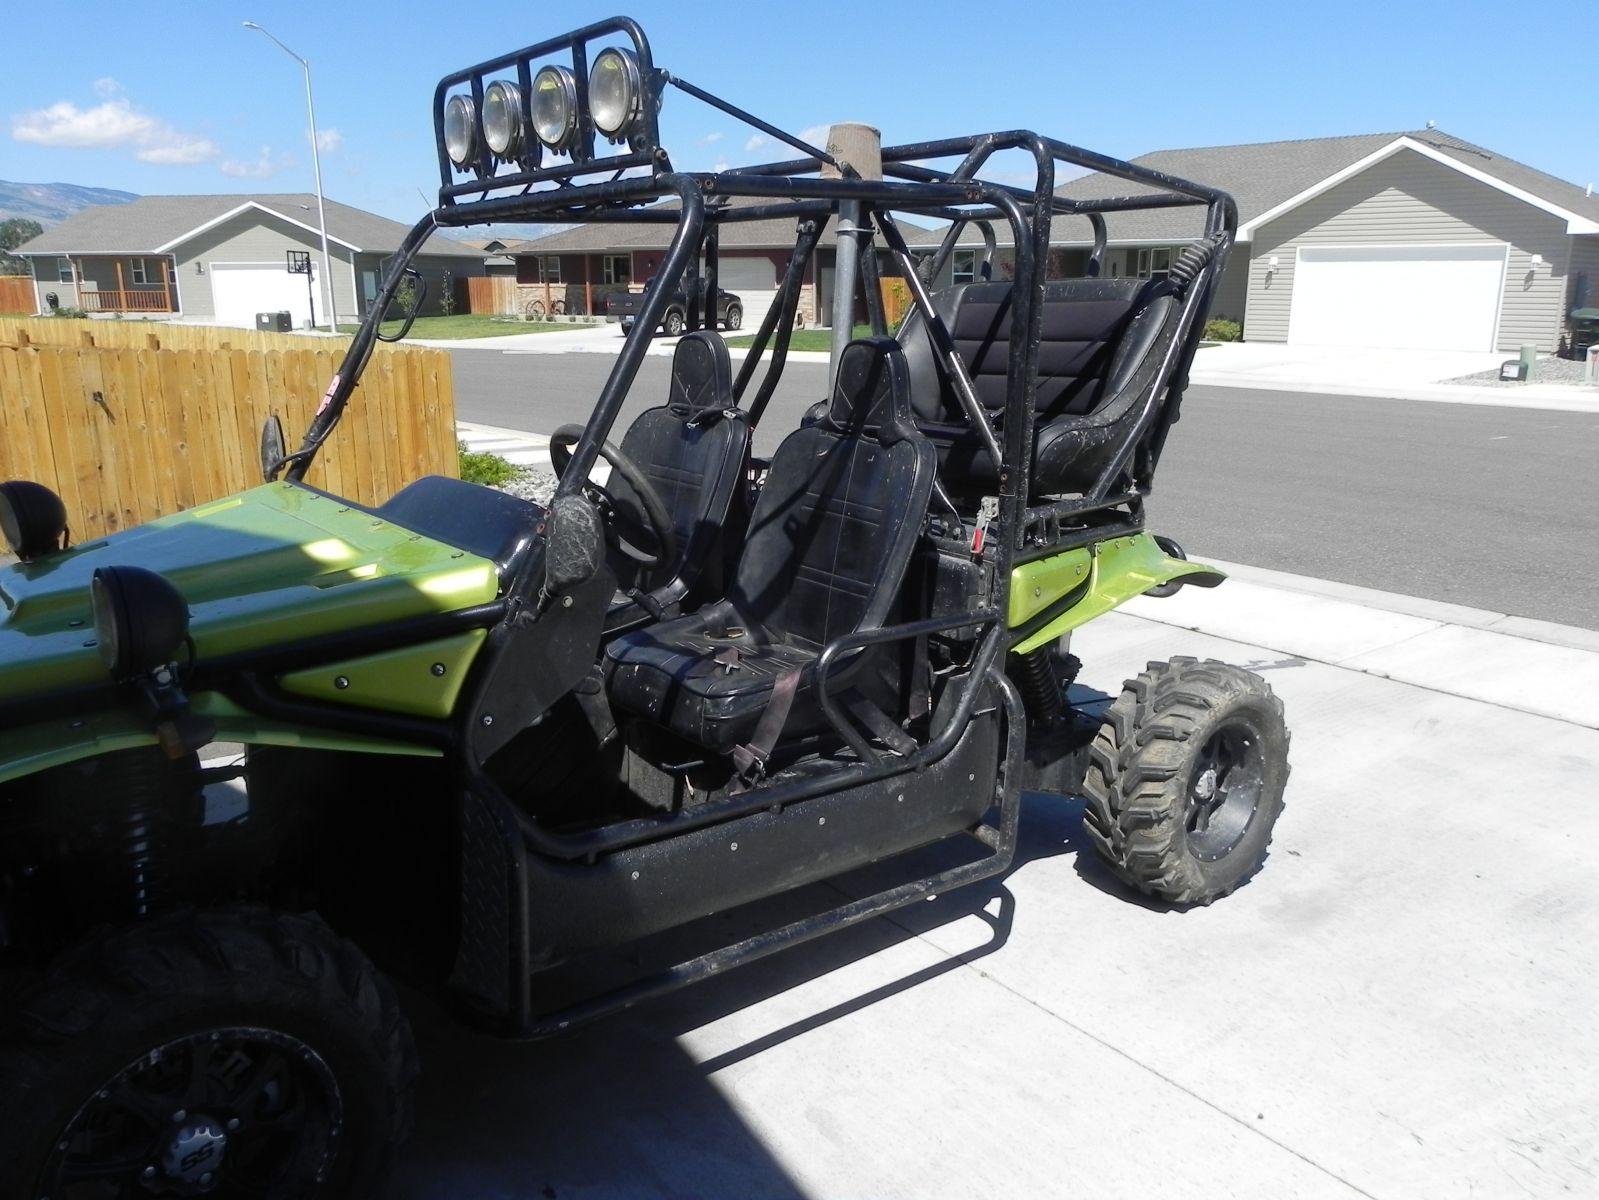 new back seat